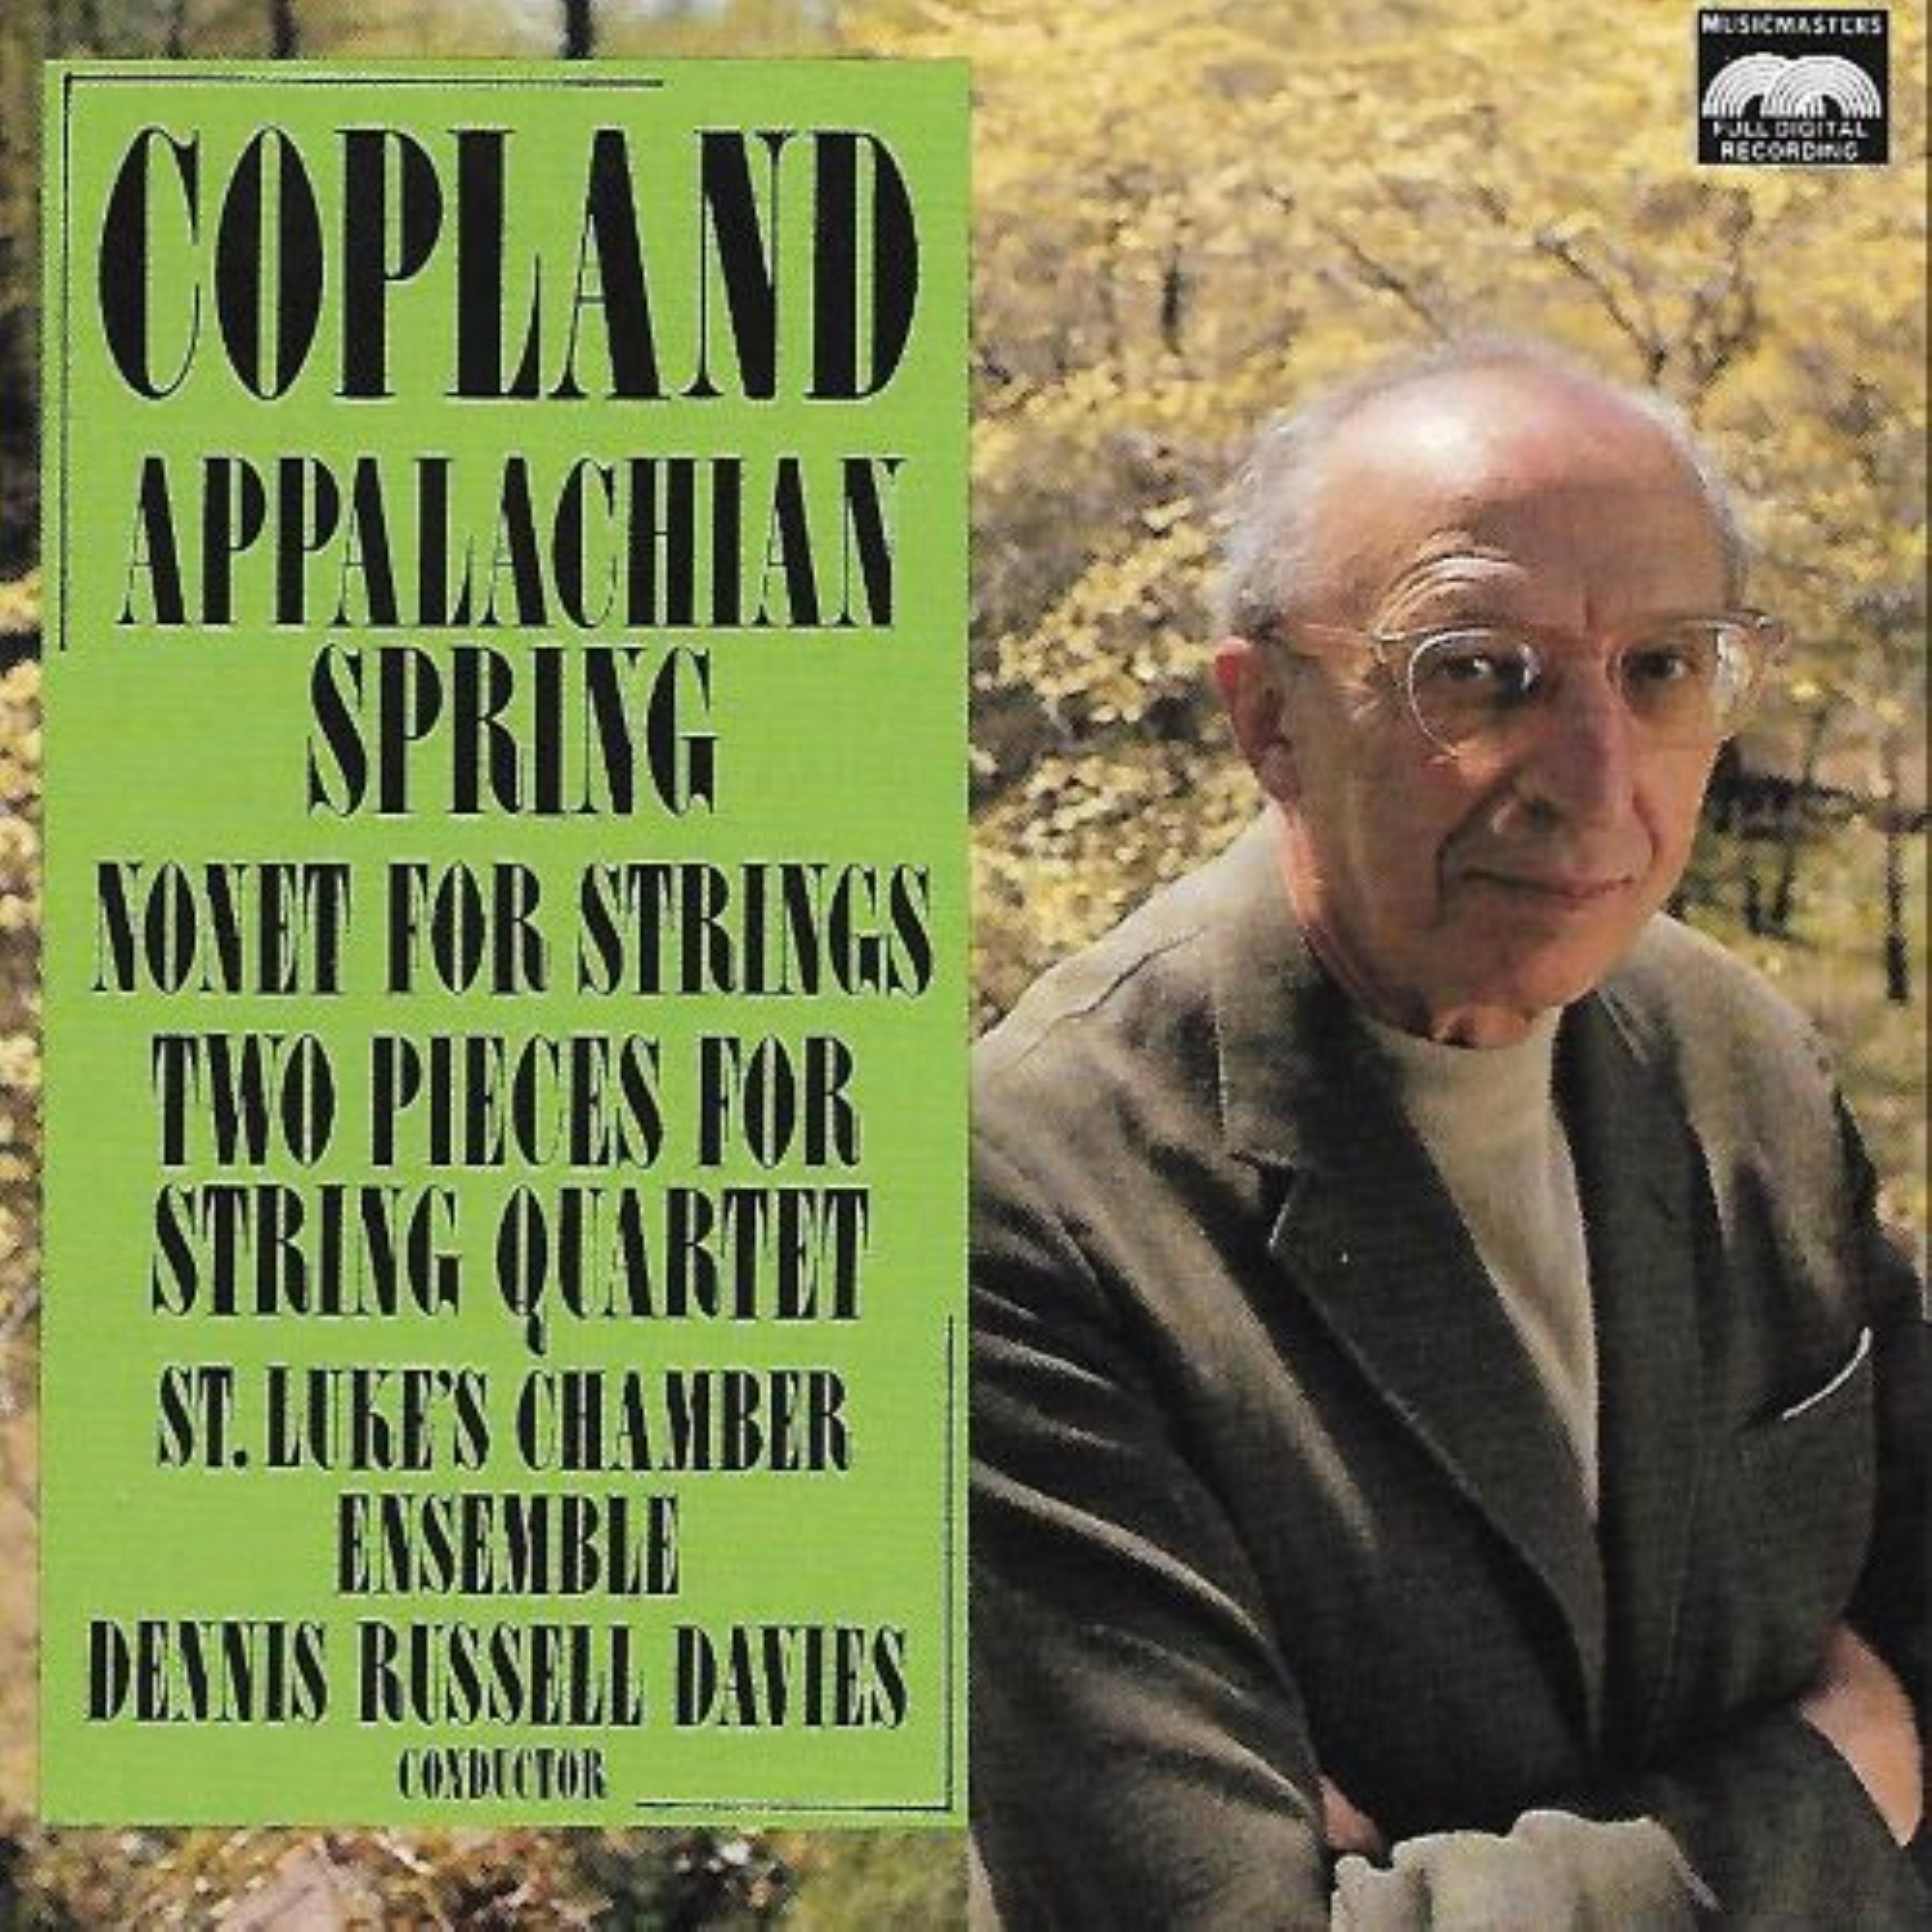 Copland App Spring